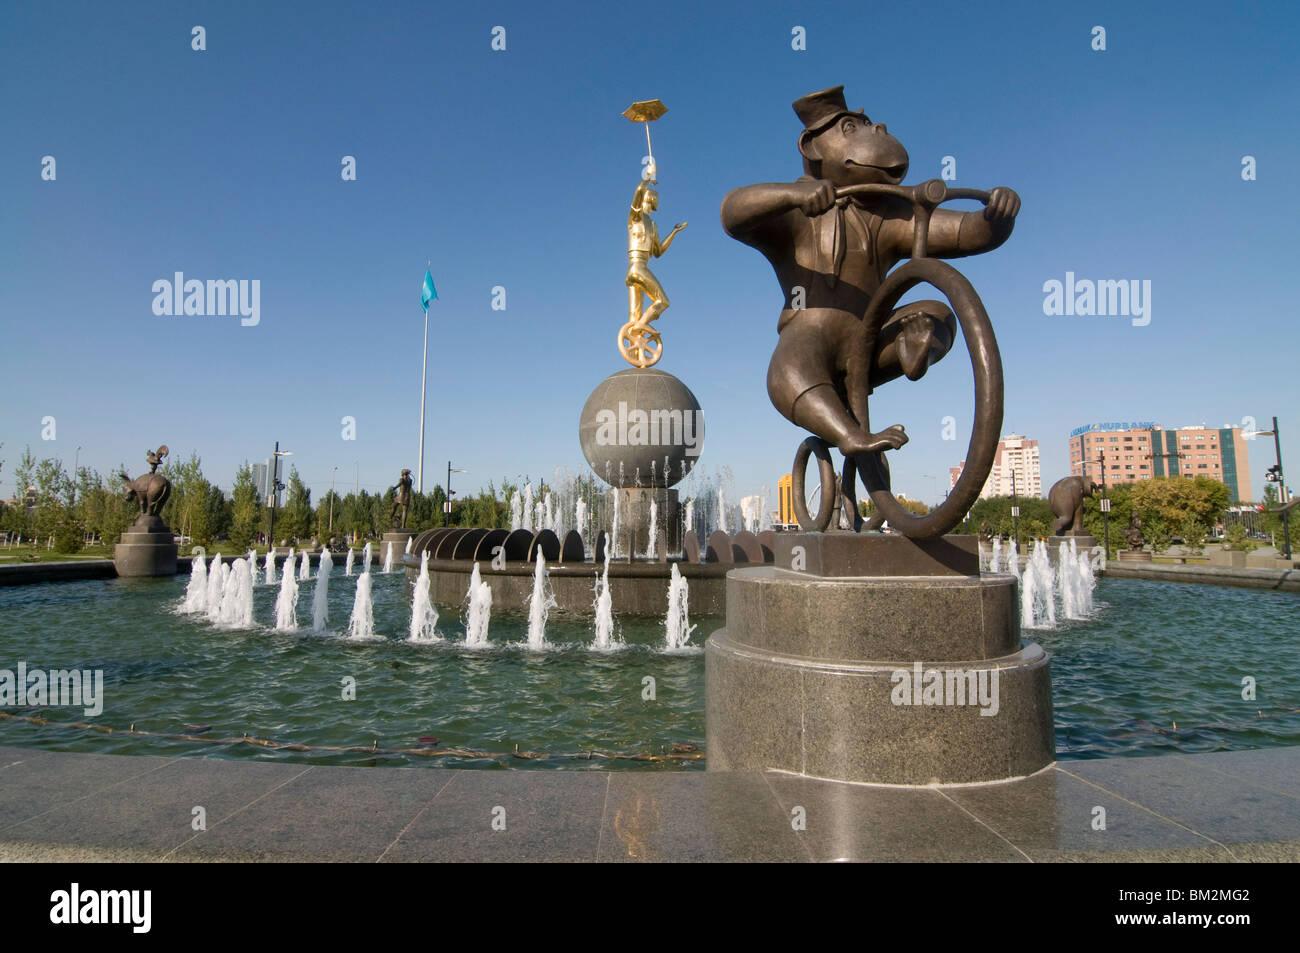 Modern fountain, Astana, Kazakhstan Stock Photo